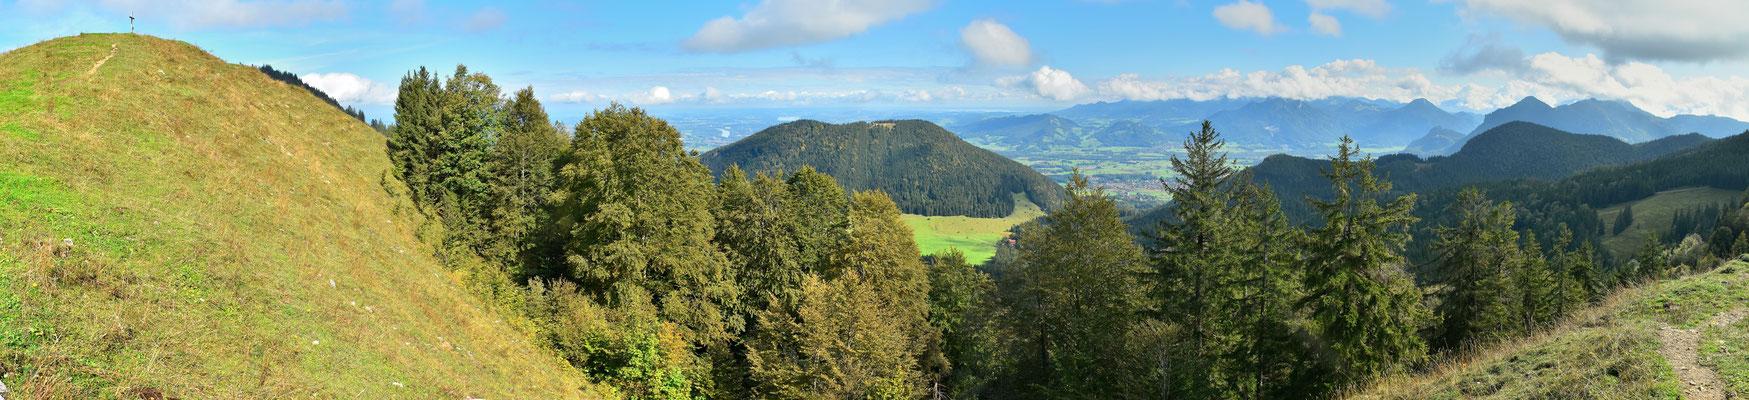 Panorama - Berge - Alpen - Wanderung - Gipfel Mitterberg